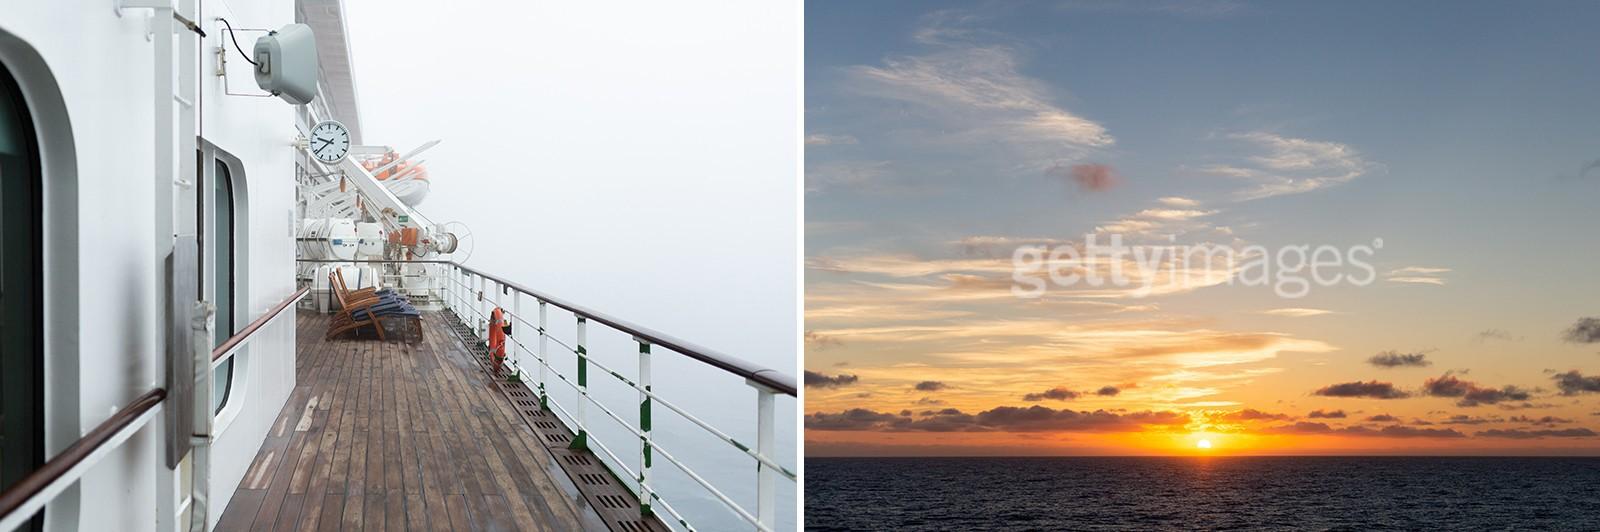 QM2 transatlantic voyage